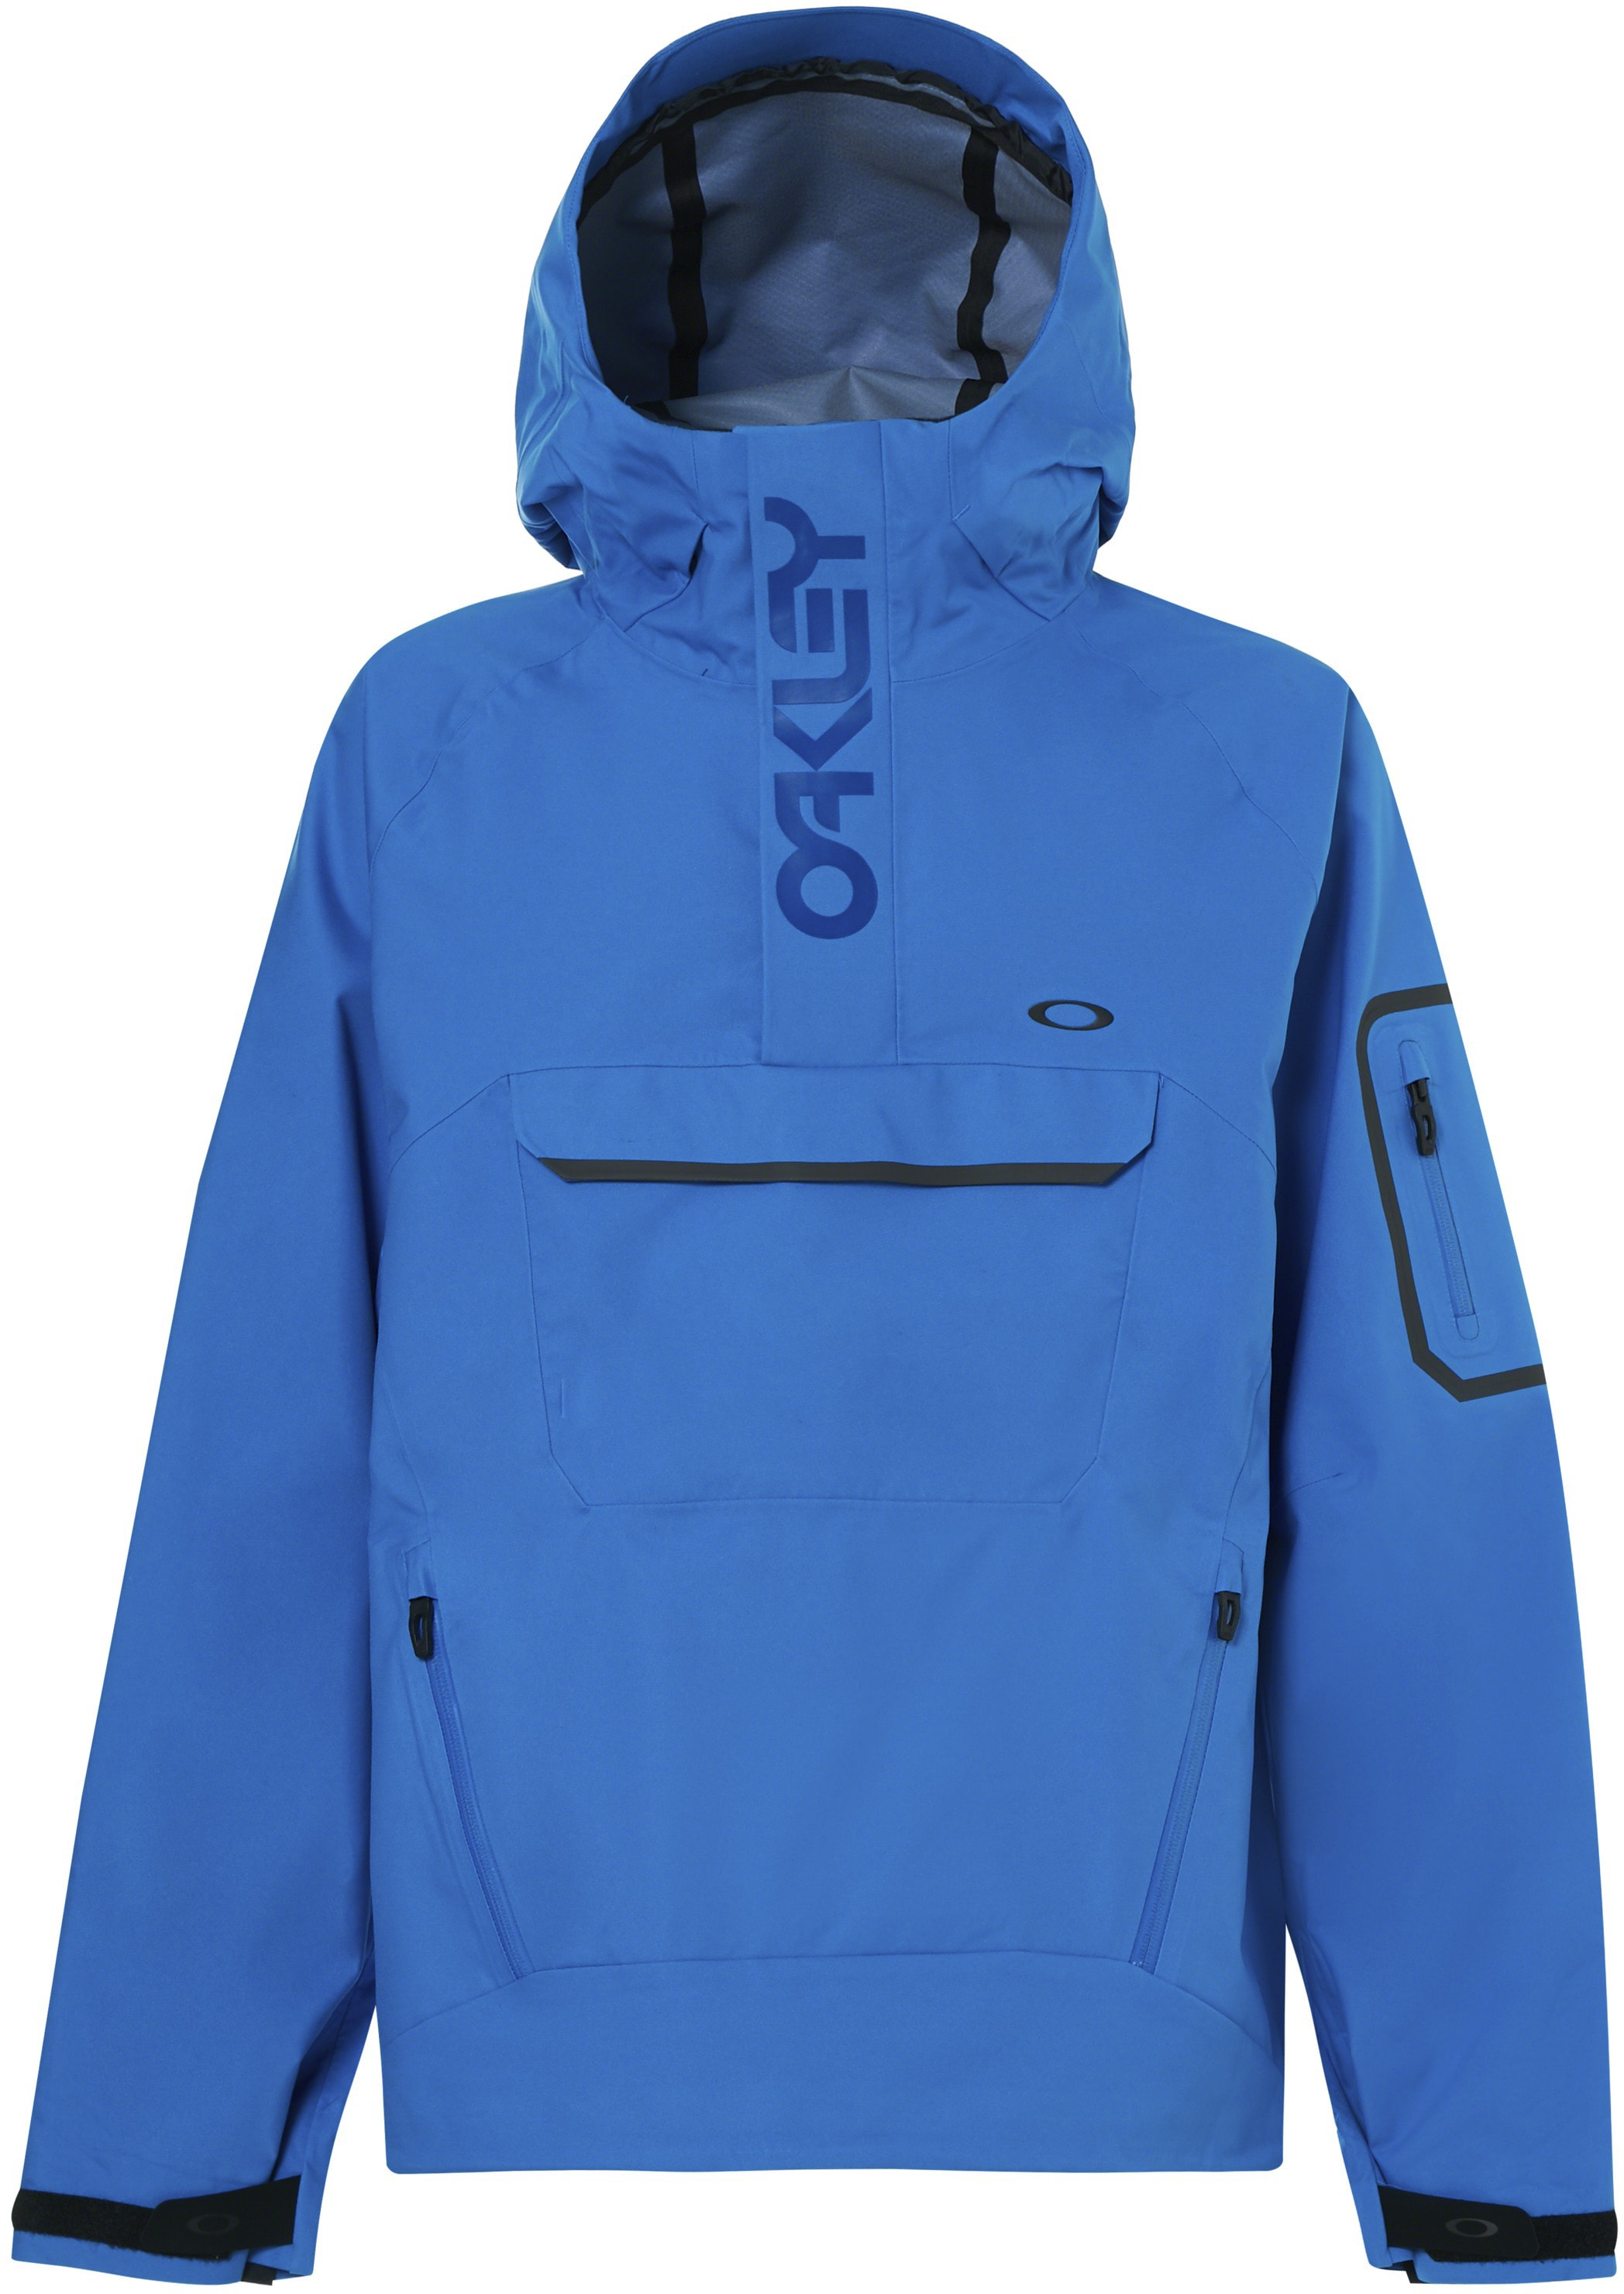 2ea5ee68f7f Oakley Snow Shell 10K 2L Anorak Snowboard Jacket - thumbnail 1